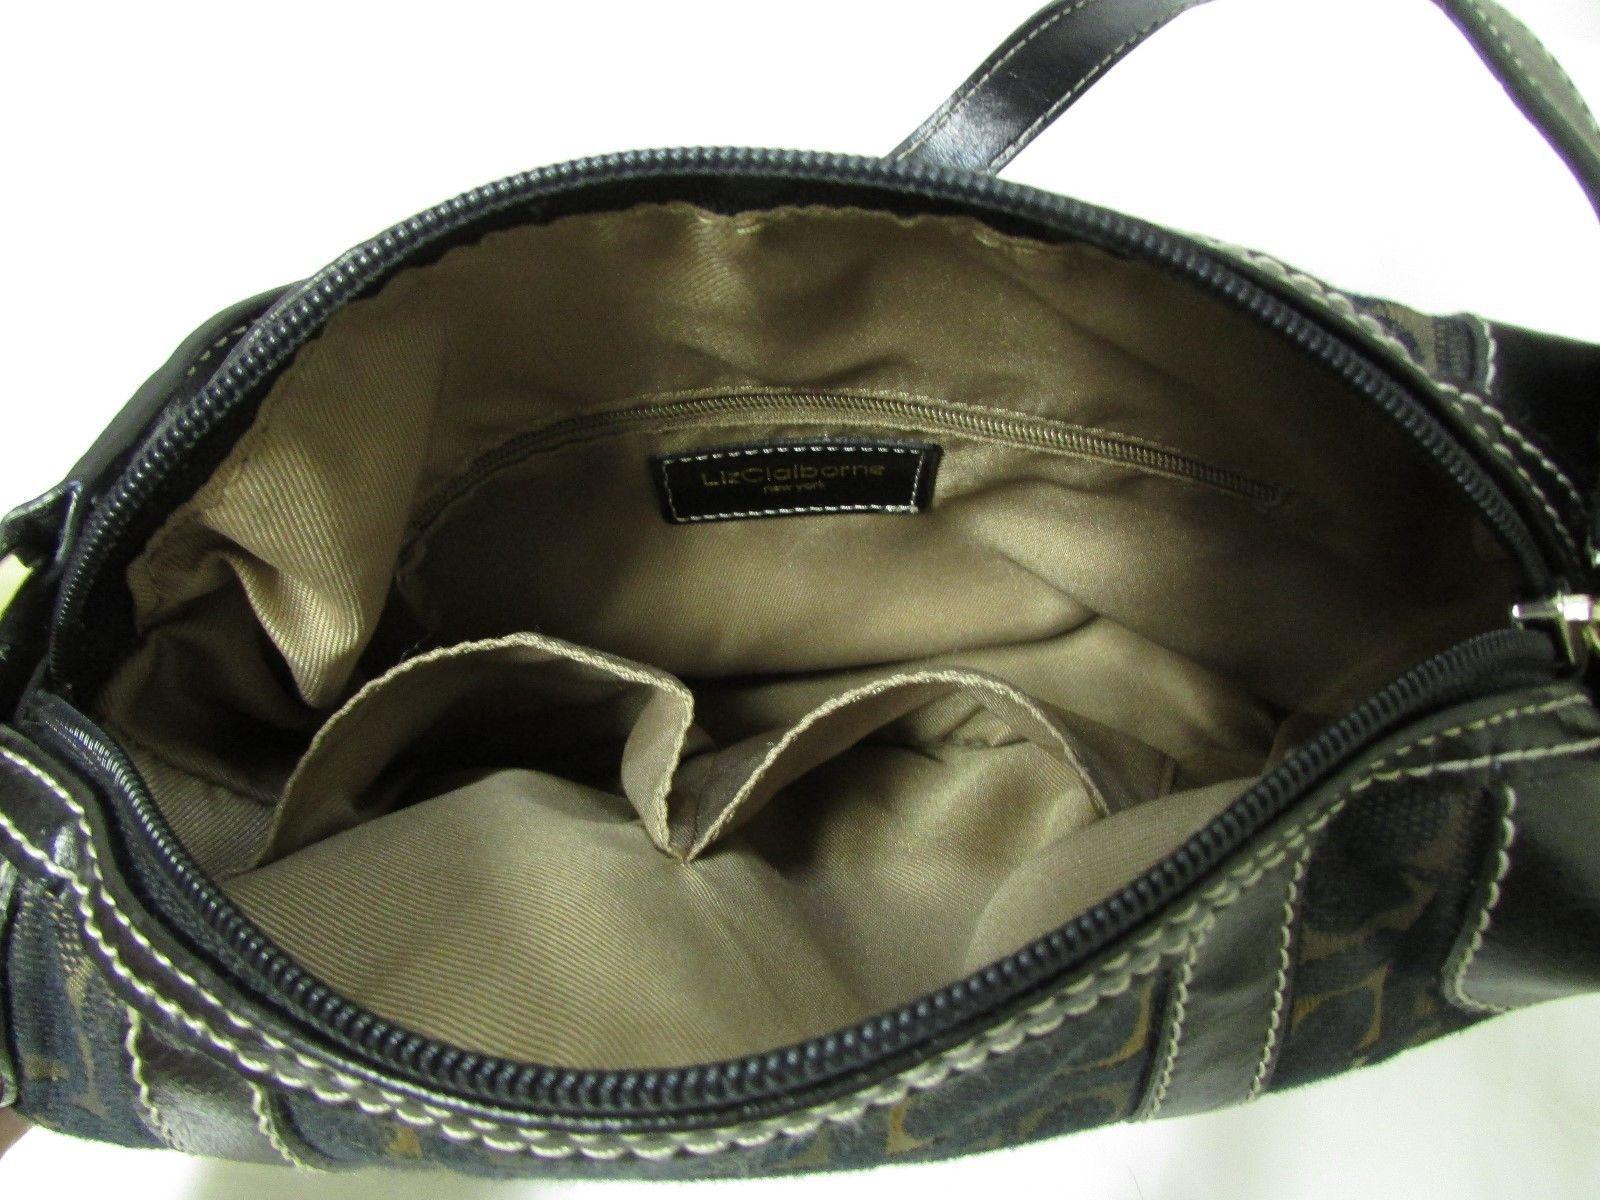 Vintage Liz Claiborne Black With Brown And Gold Fabric Shoulder Handbag Sz S image 5